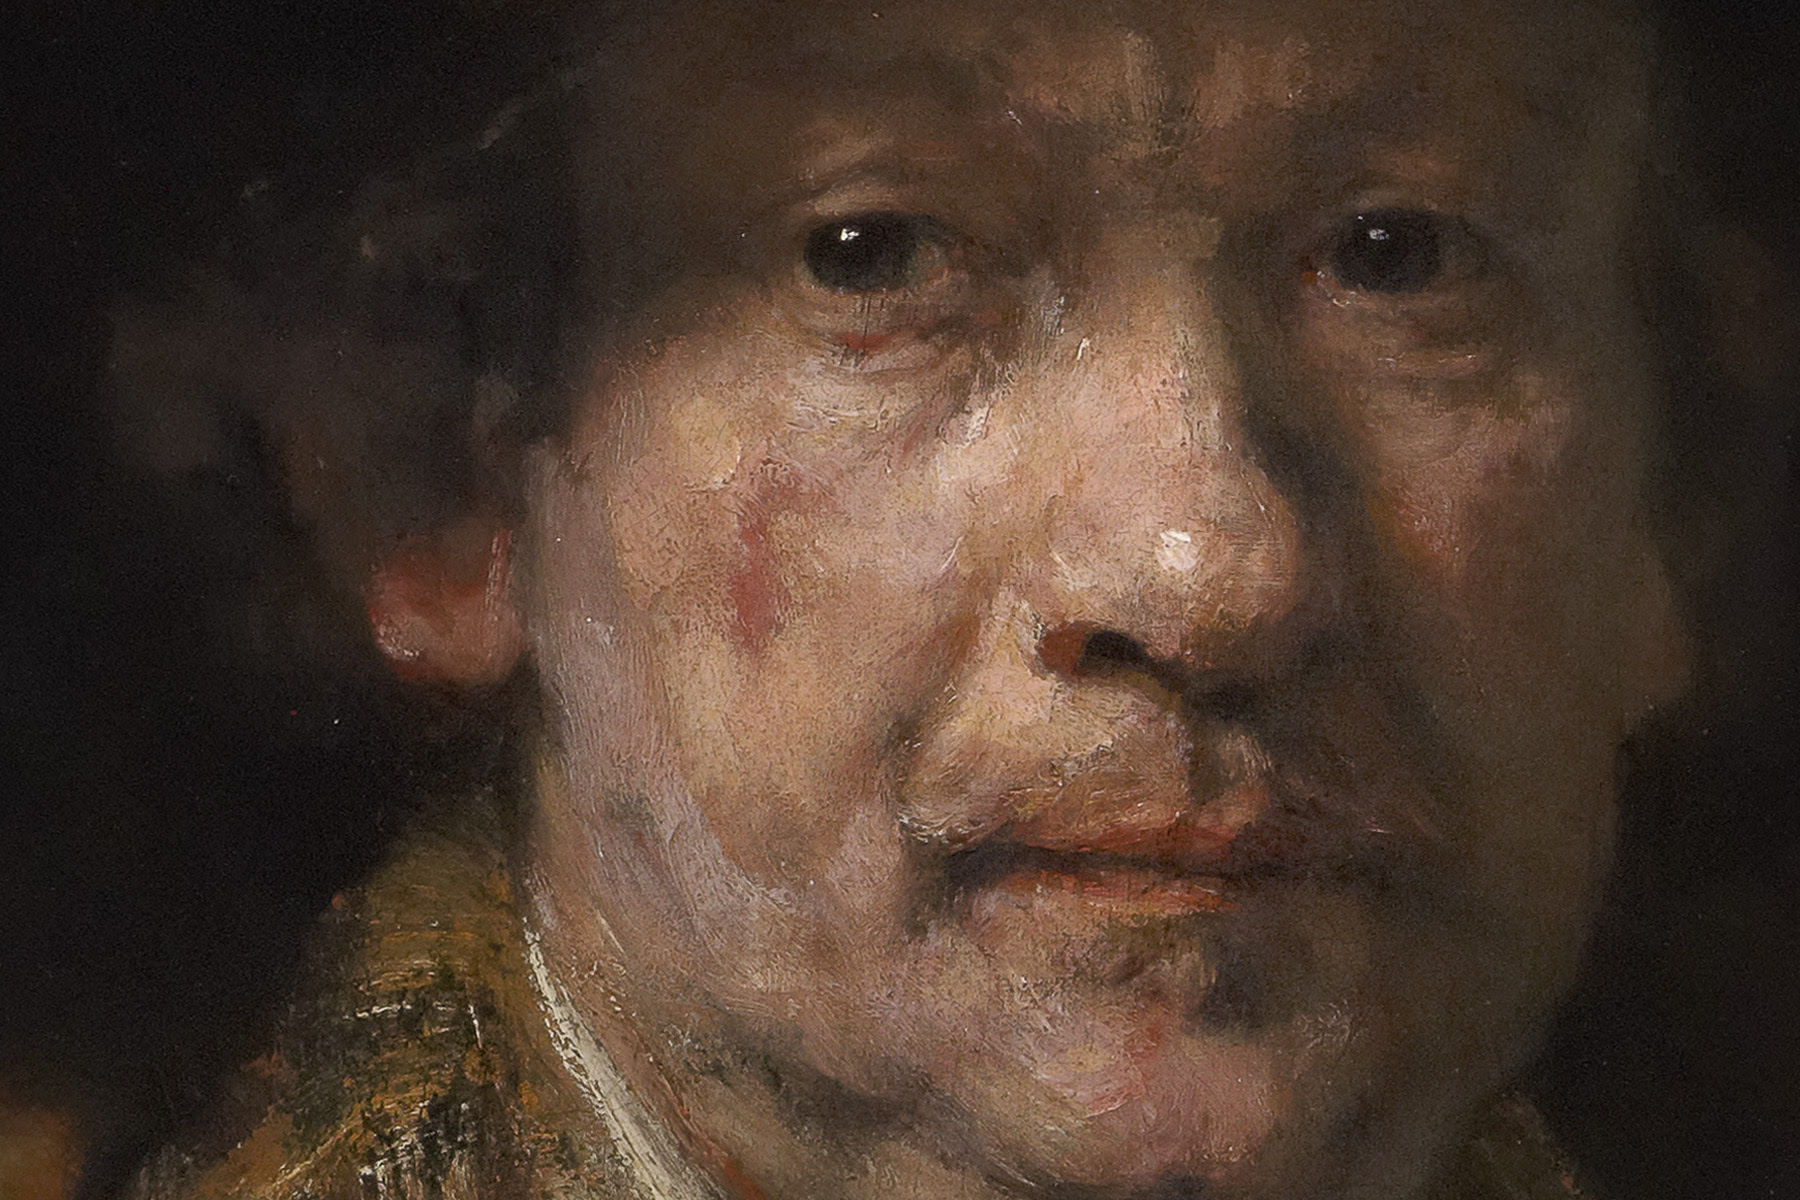 Rembrandt van Rijn (Dutch, 1606–1669), Self-Portrait (detail)